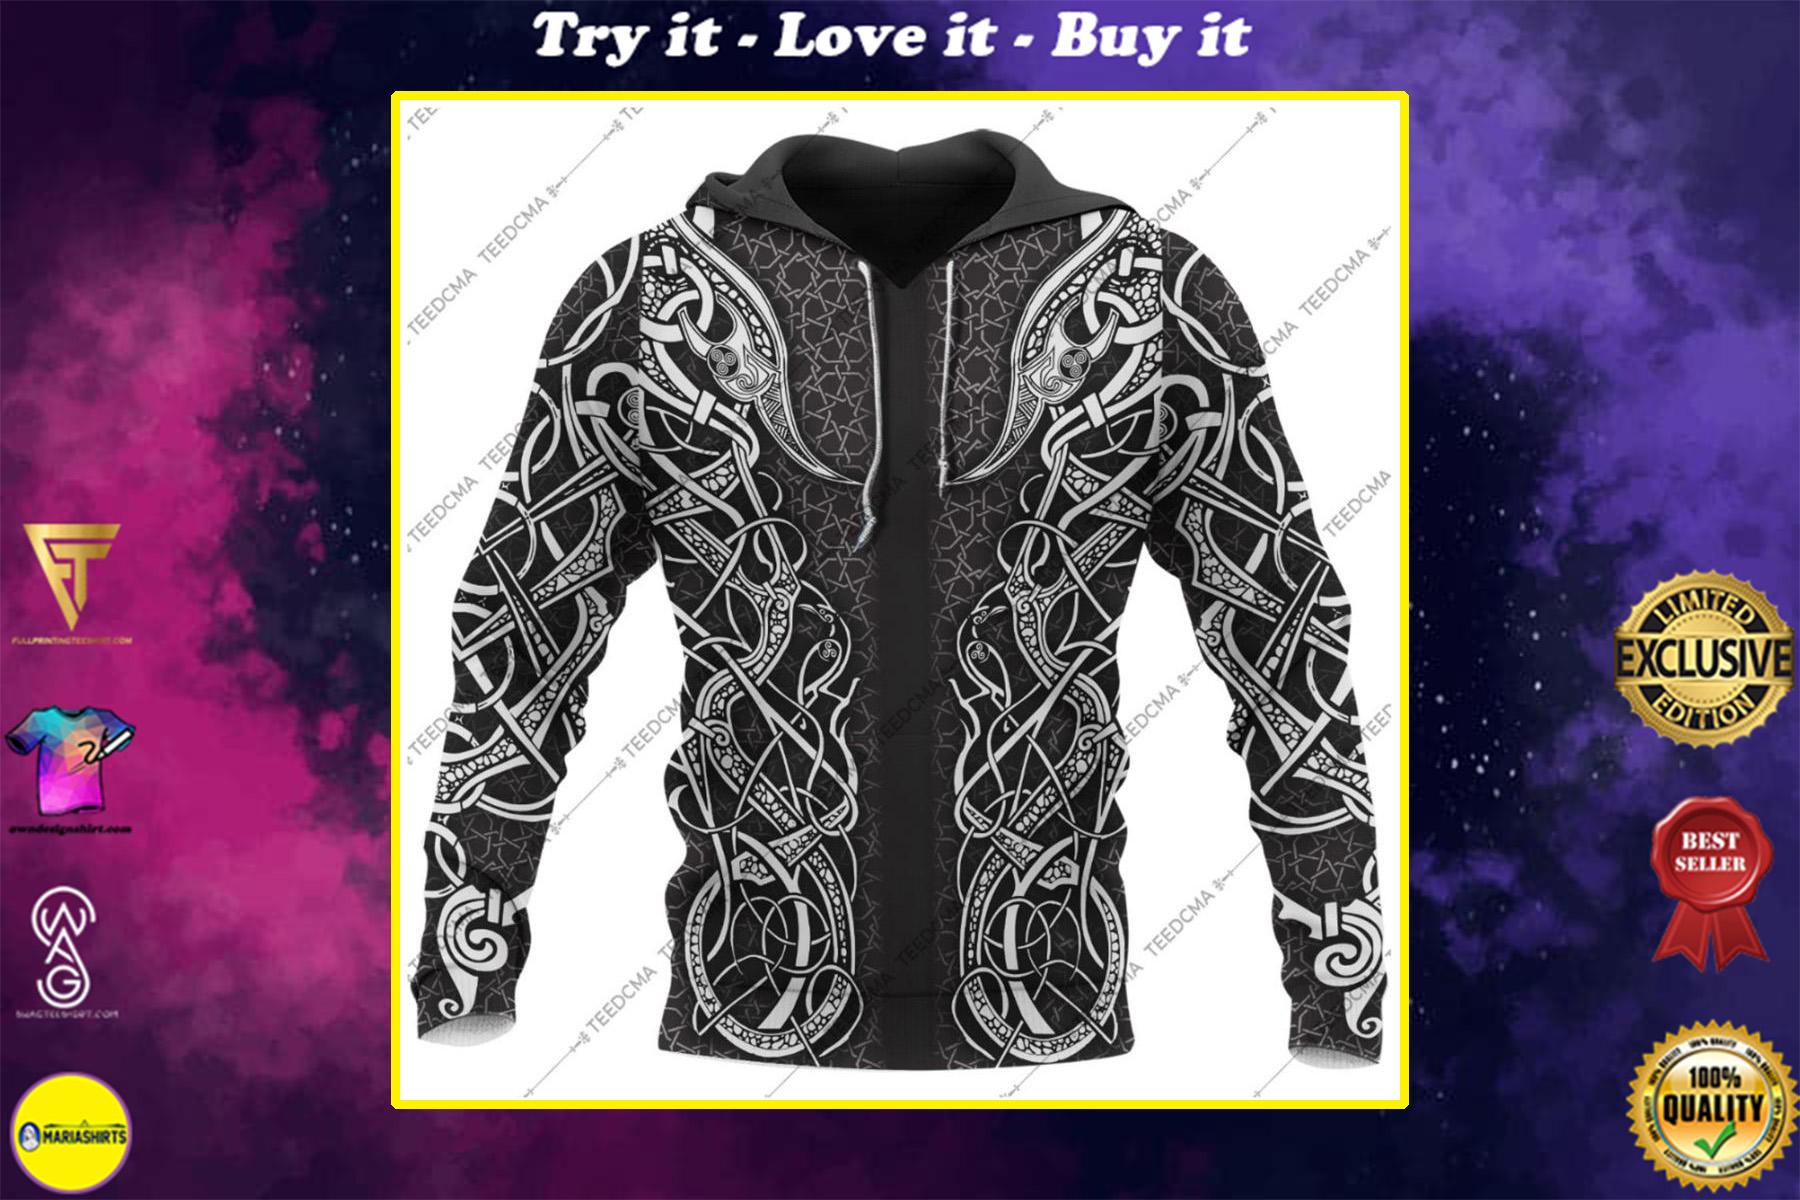 freya viking all over printed shirt